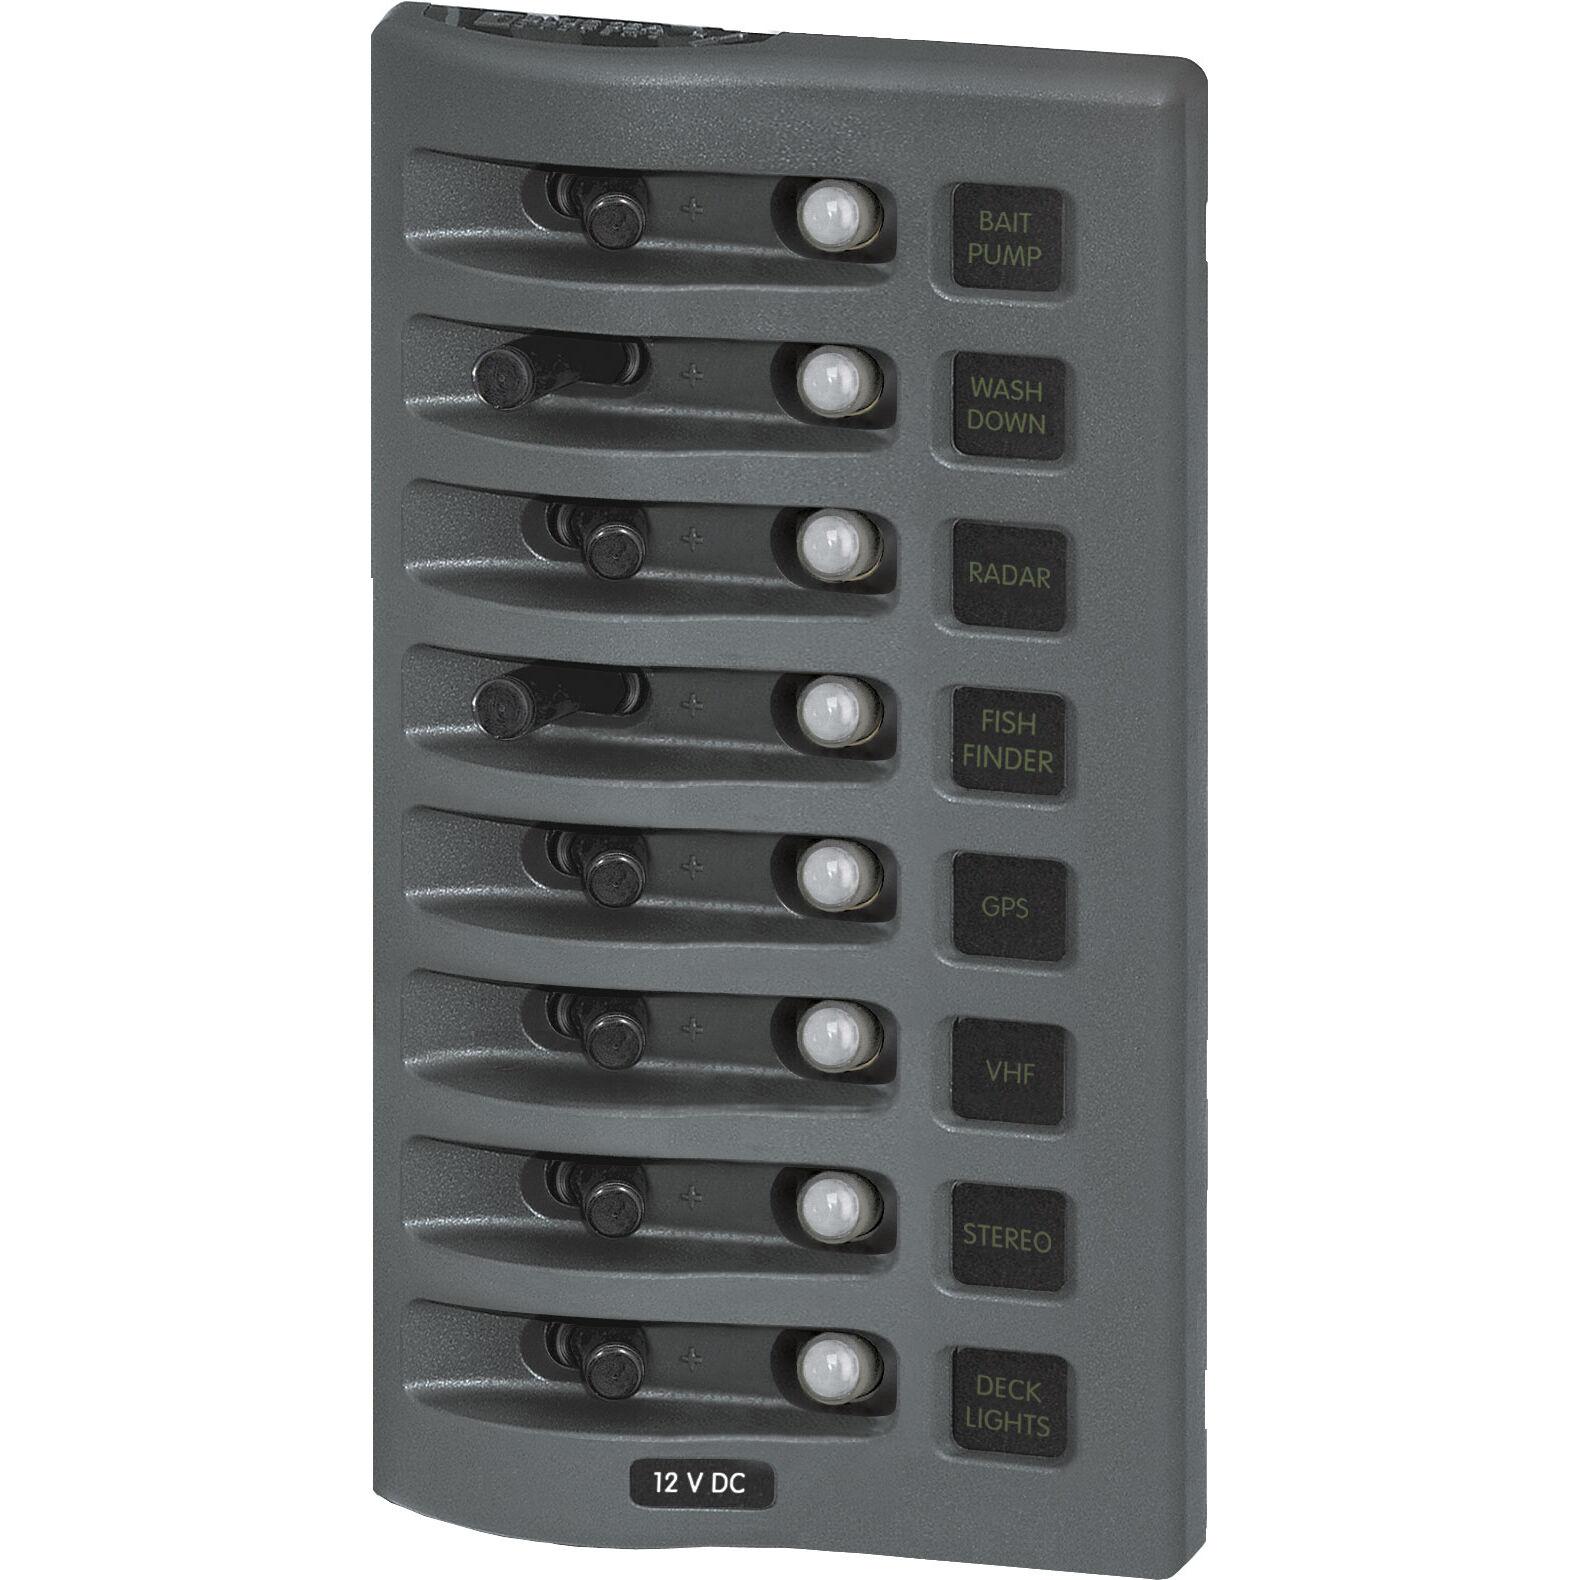 Circuit Breaker Panel Installation